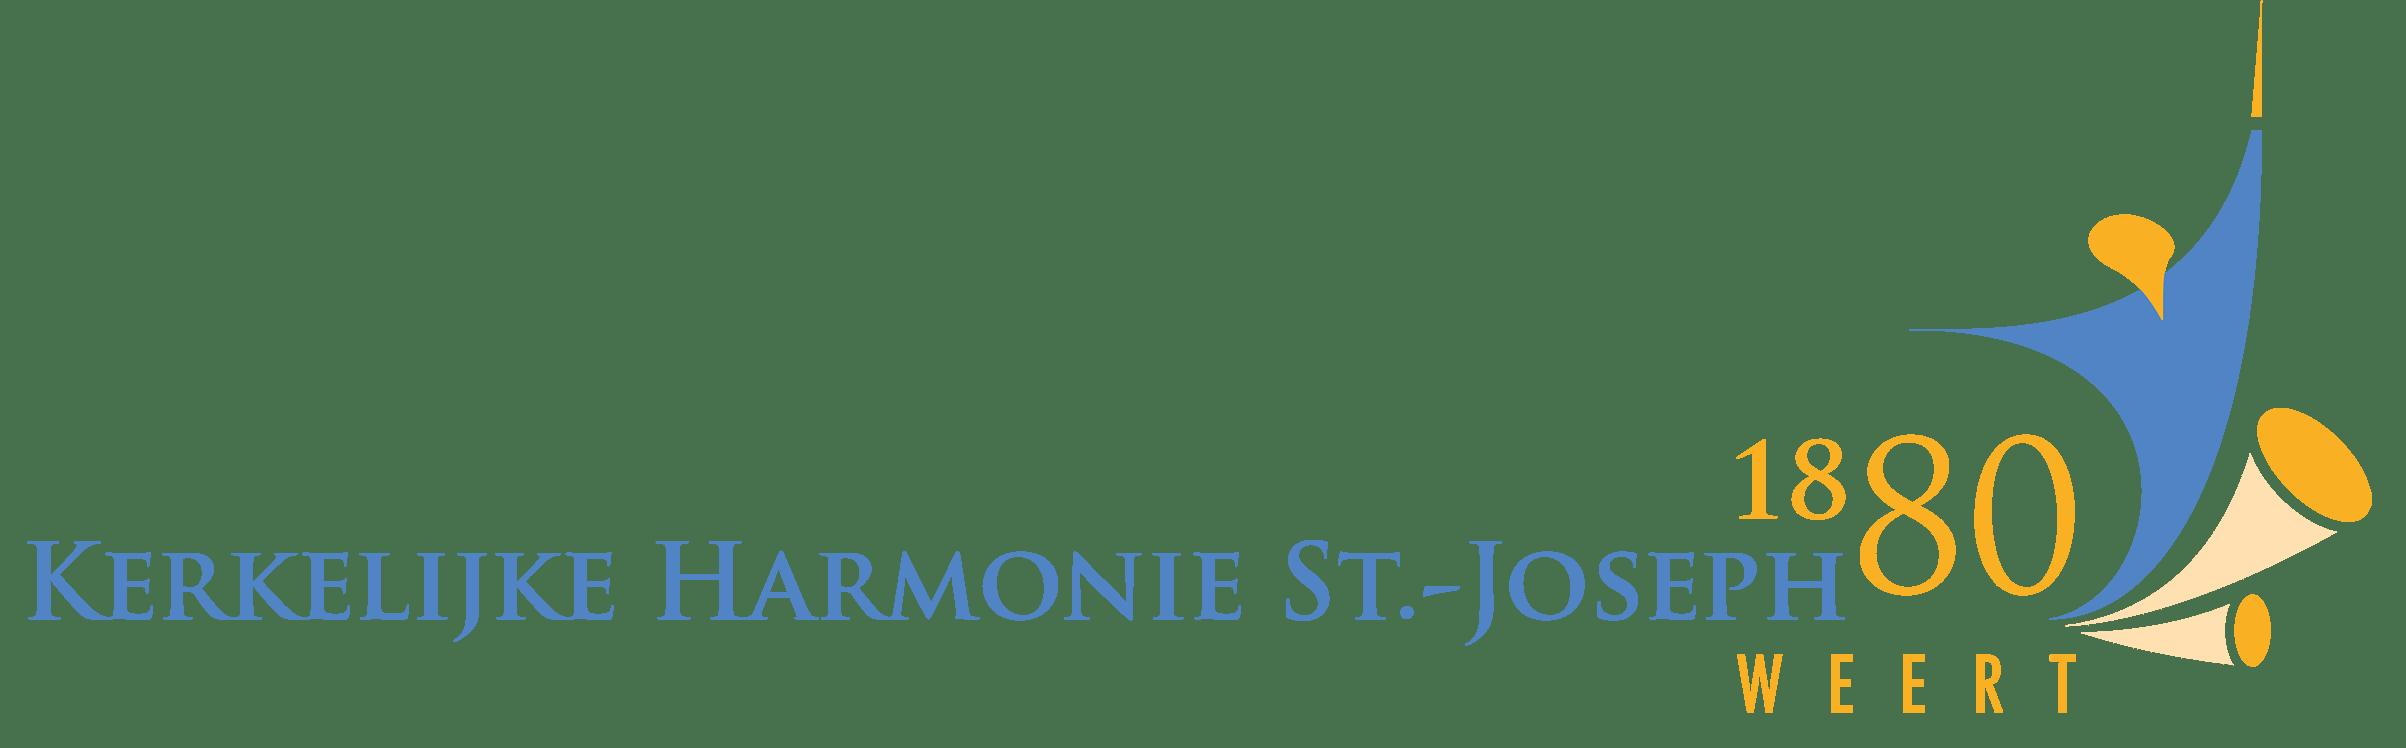 Kerkelijke Harmonie